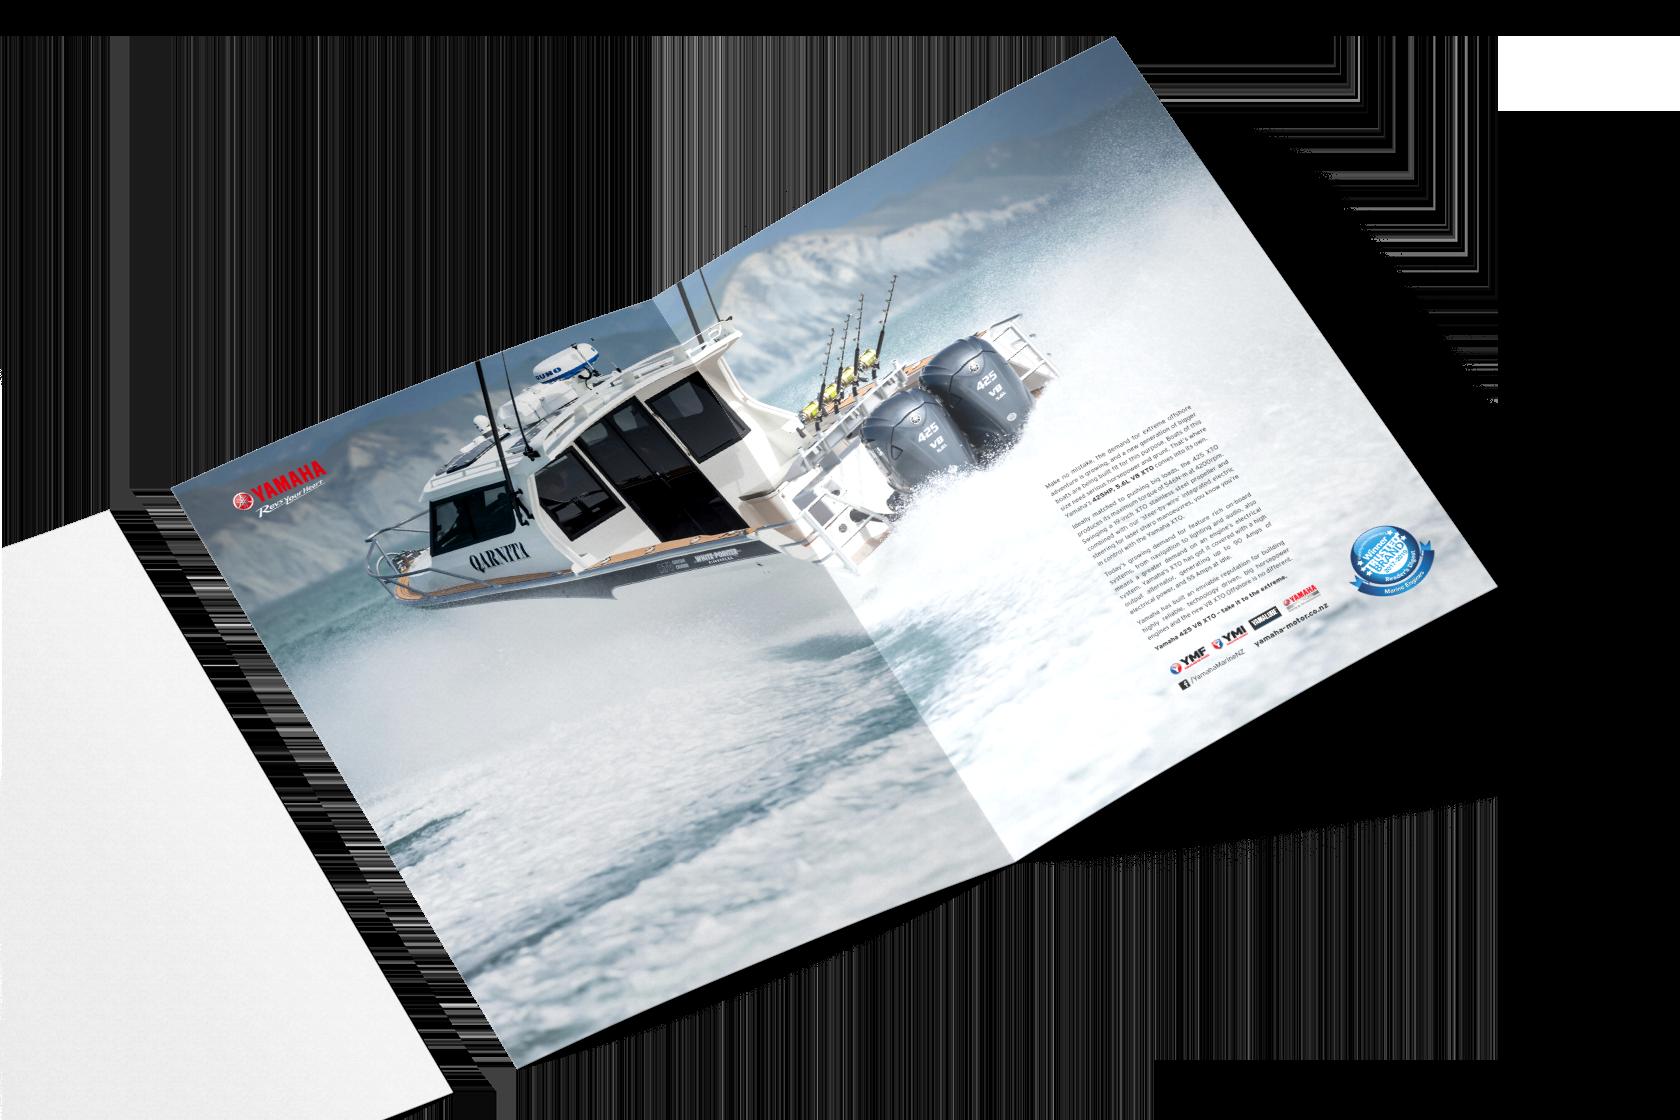 08 Yamaha Outboard Landscape 1680x1120px